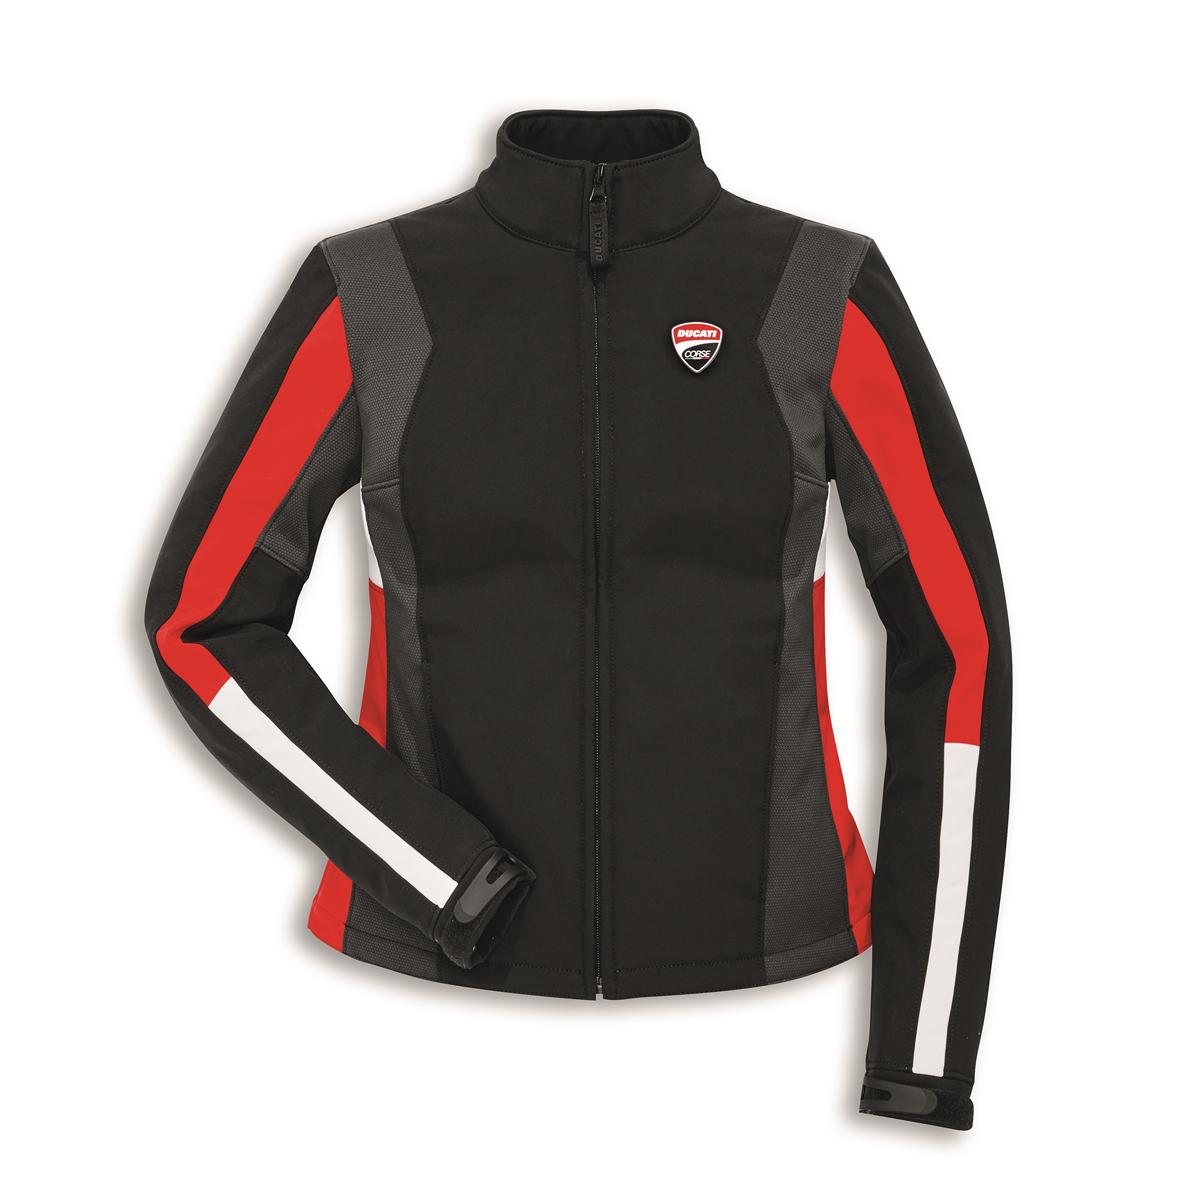 Ducati Corse Jacket Softshell Windproof 3 Damen Spidi NEUE Freizeitjacke